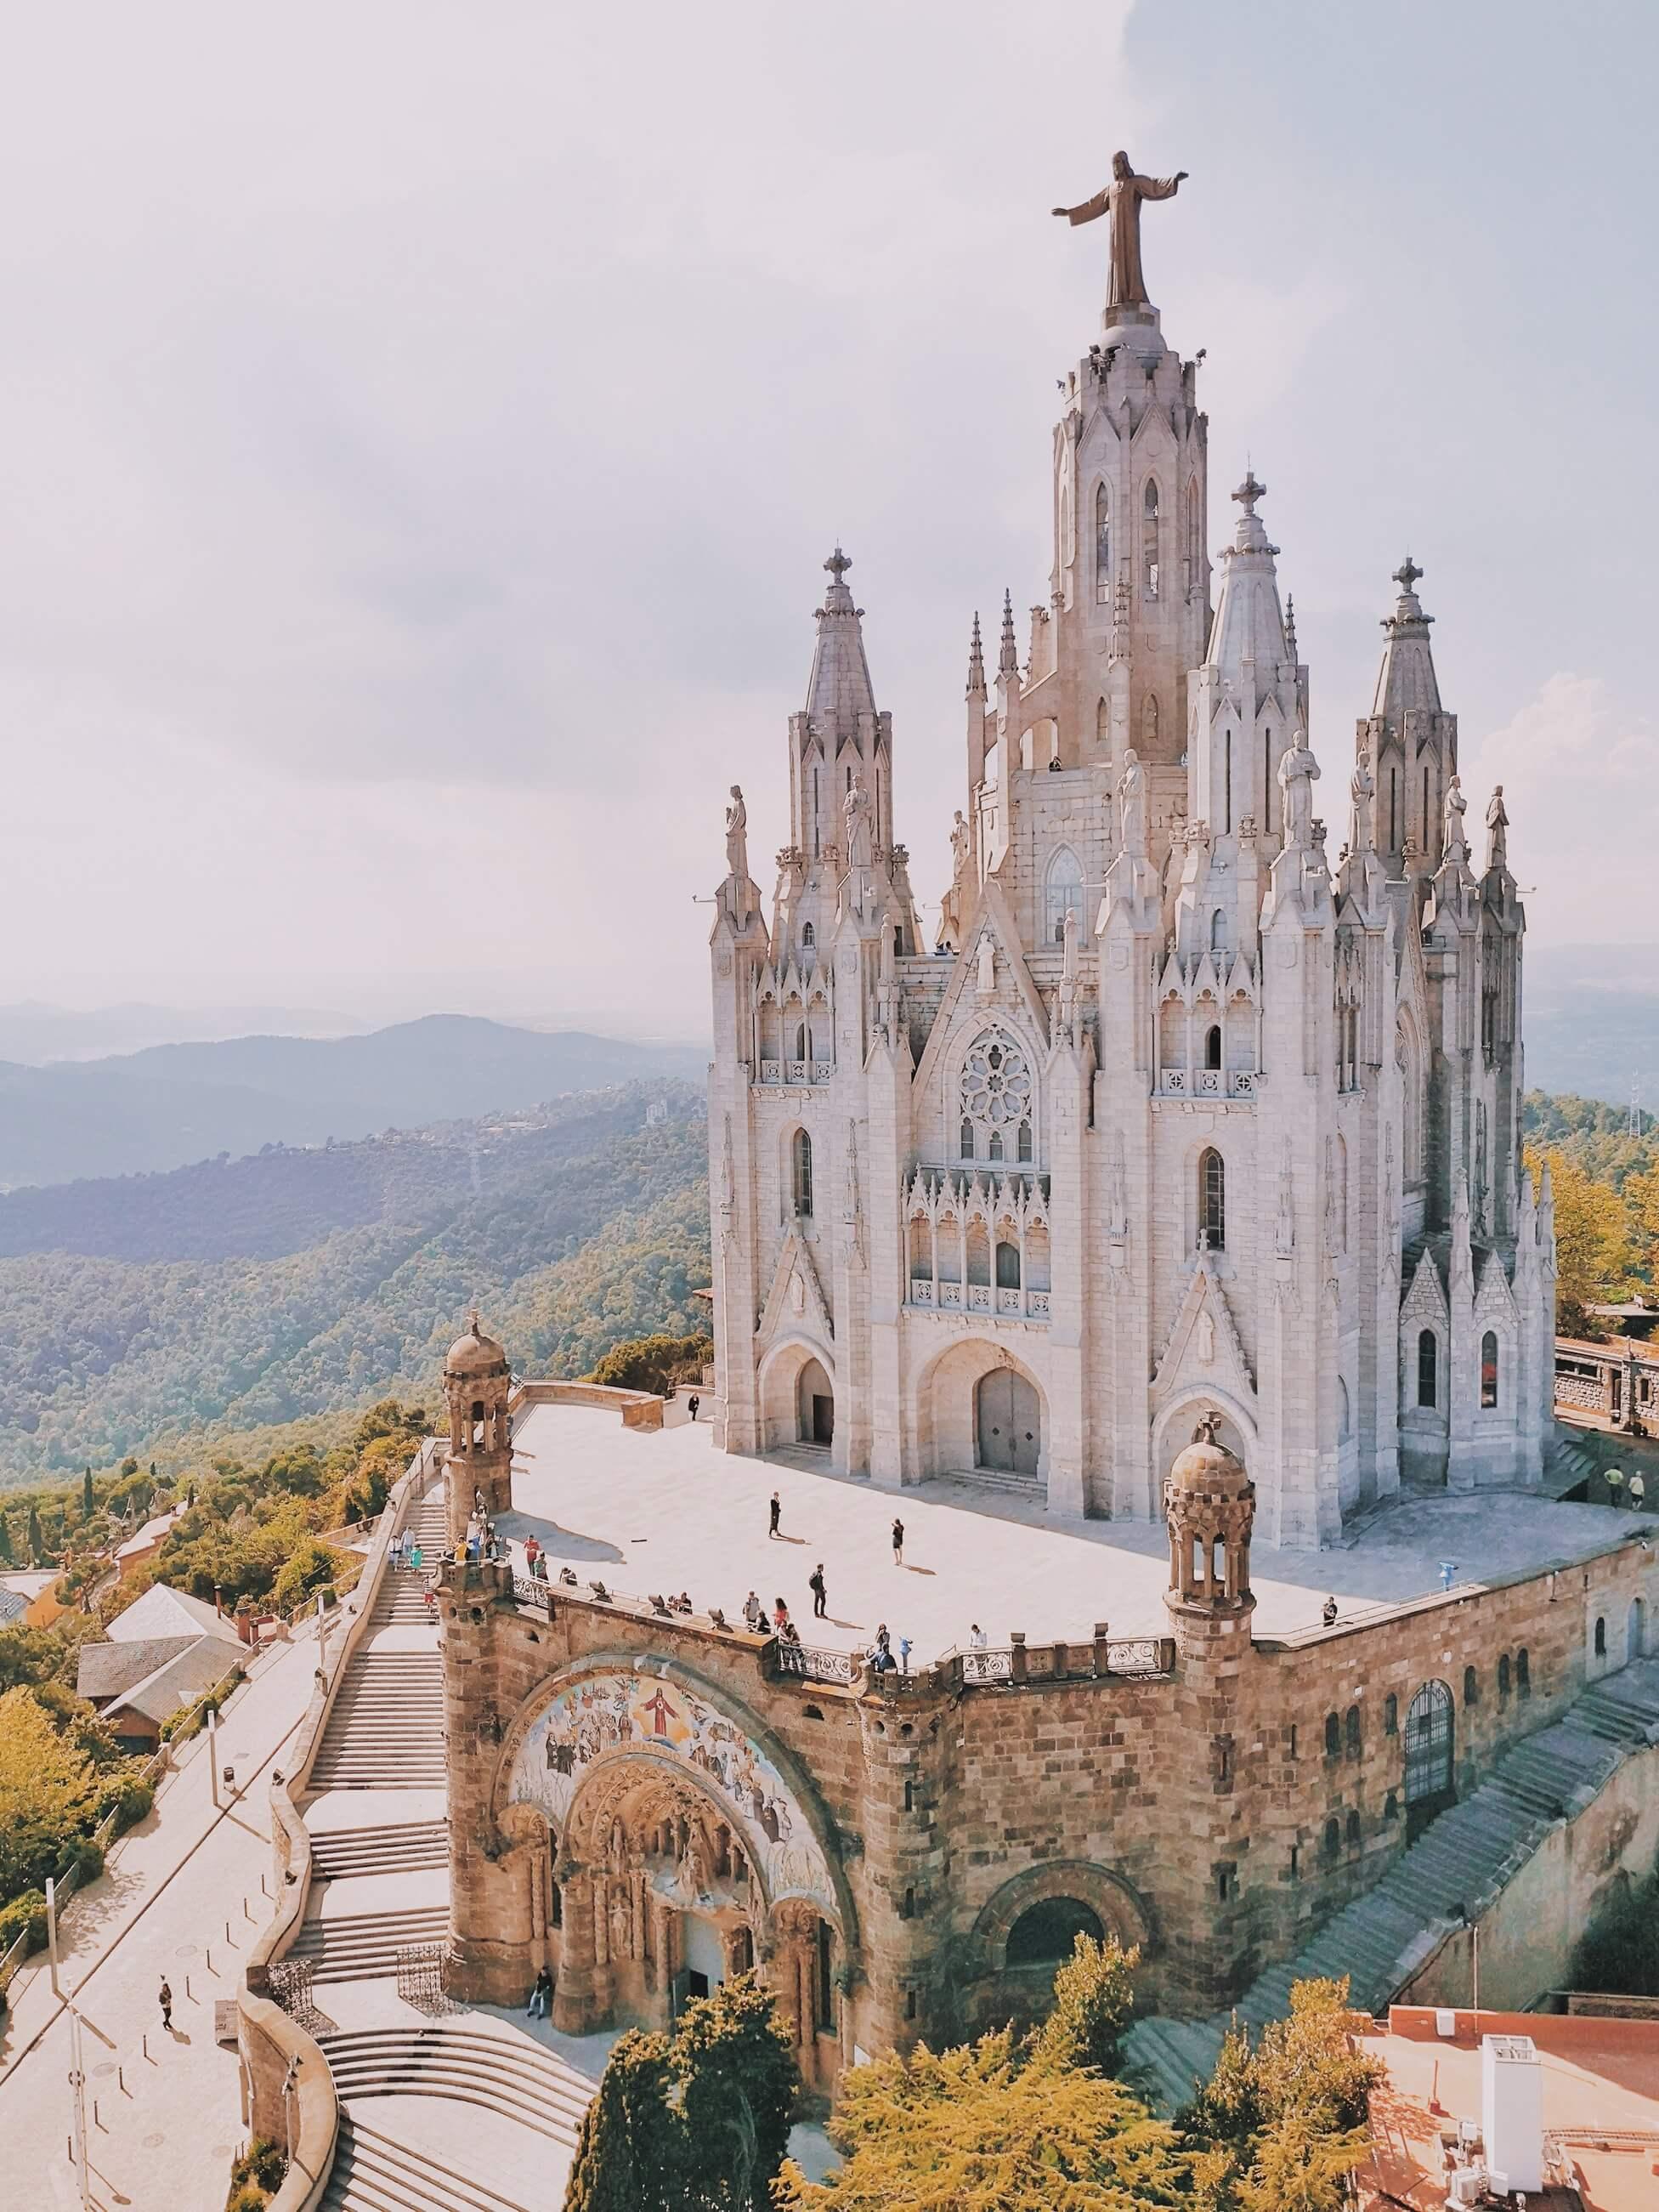 Case vacanze in affitto a Spagna